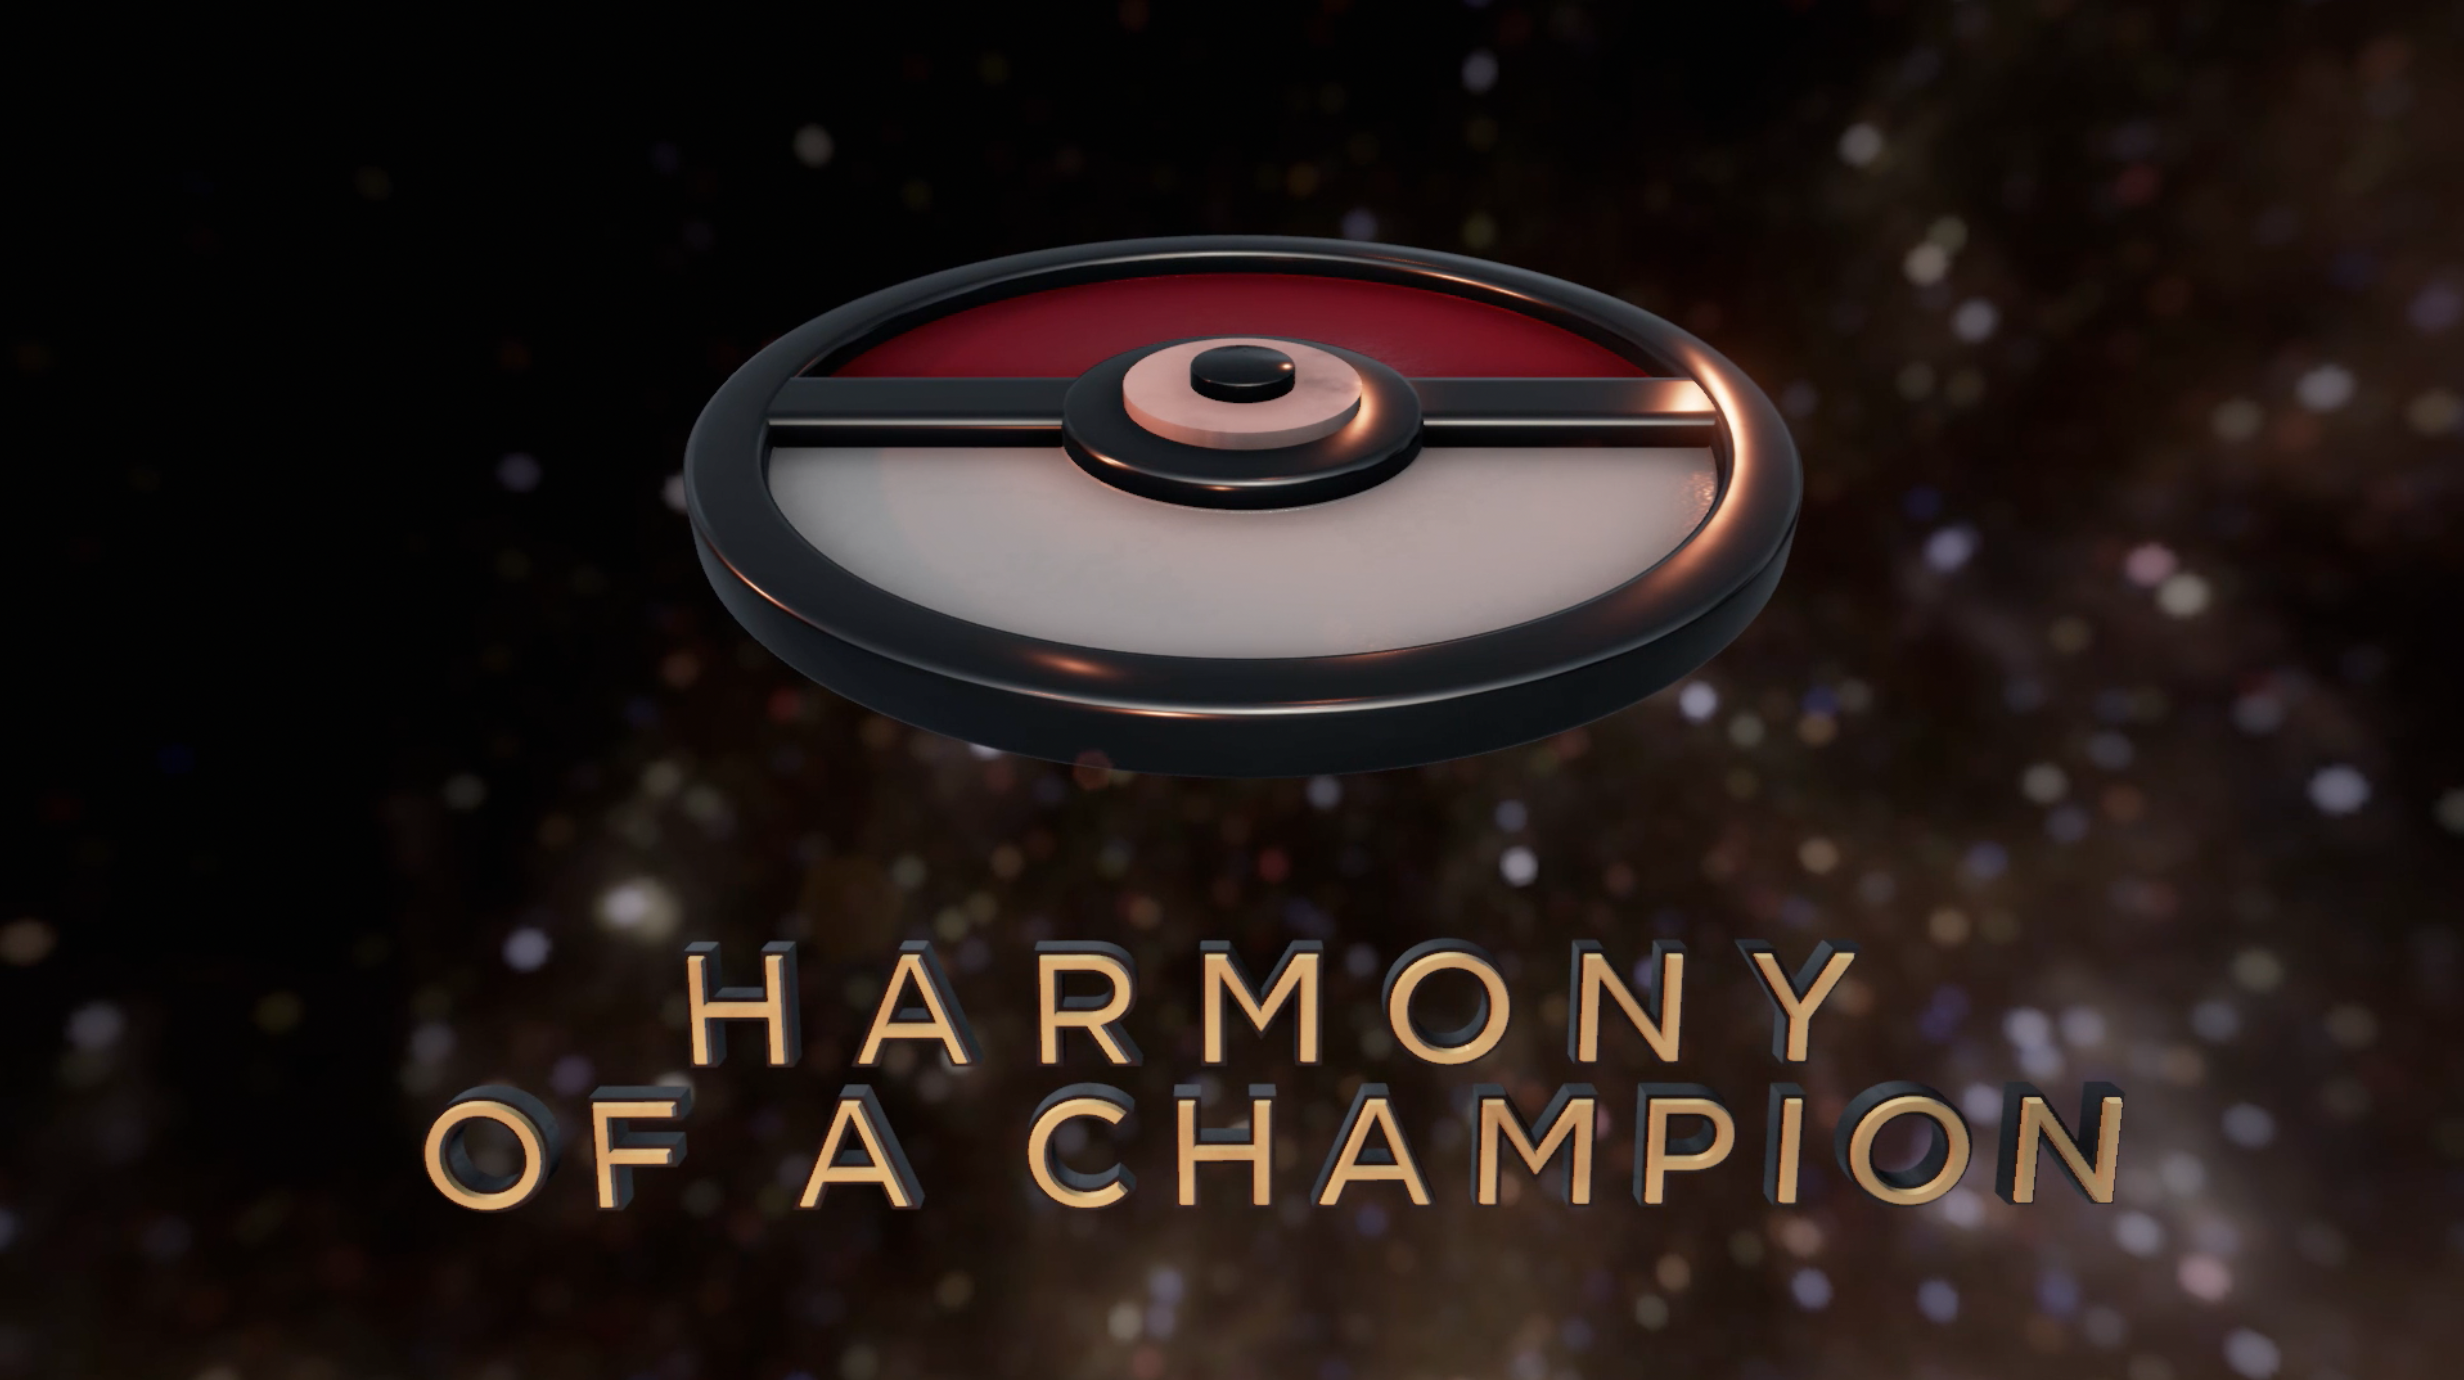 harmonyofachampion